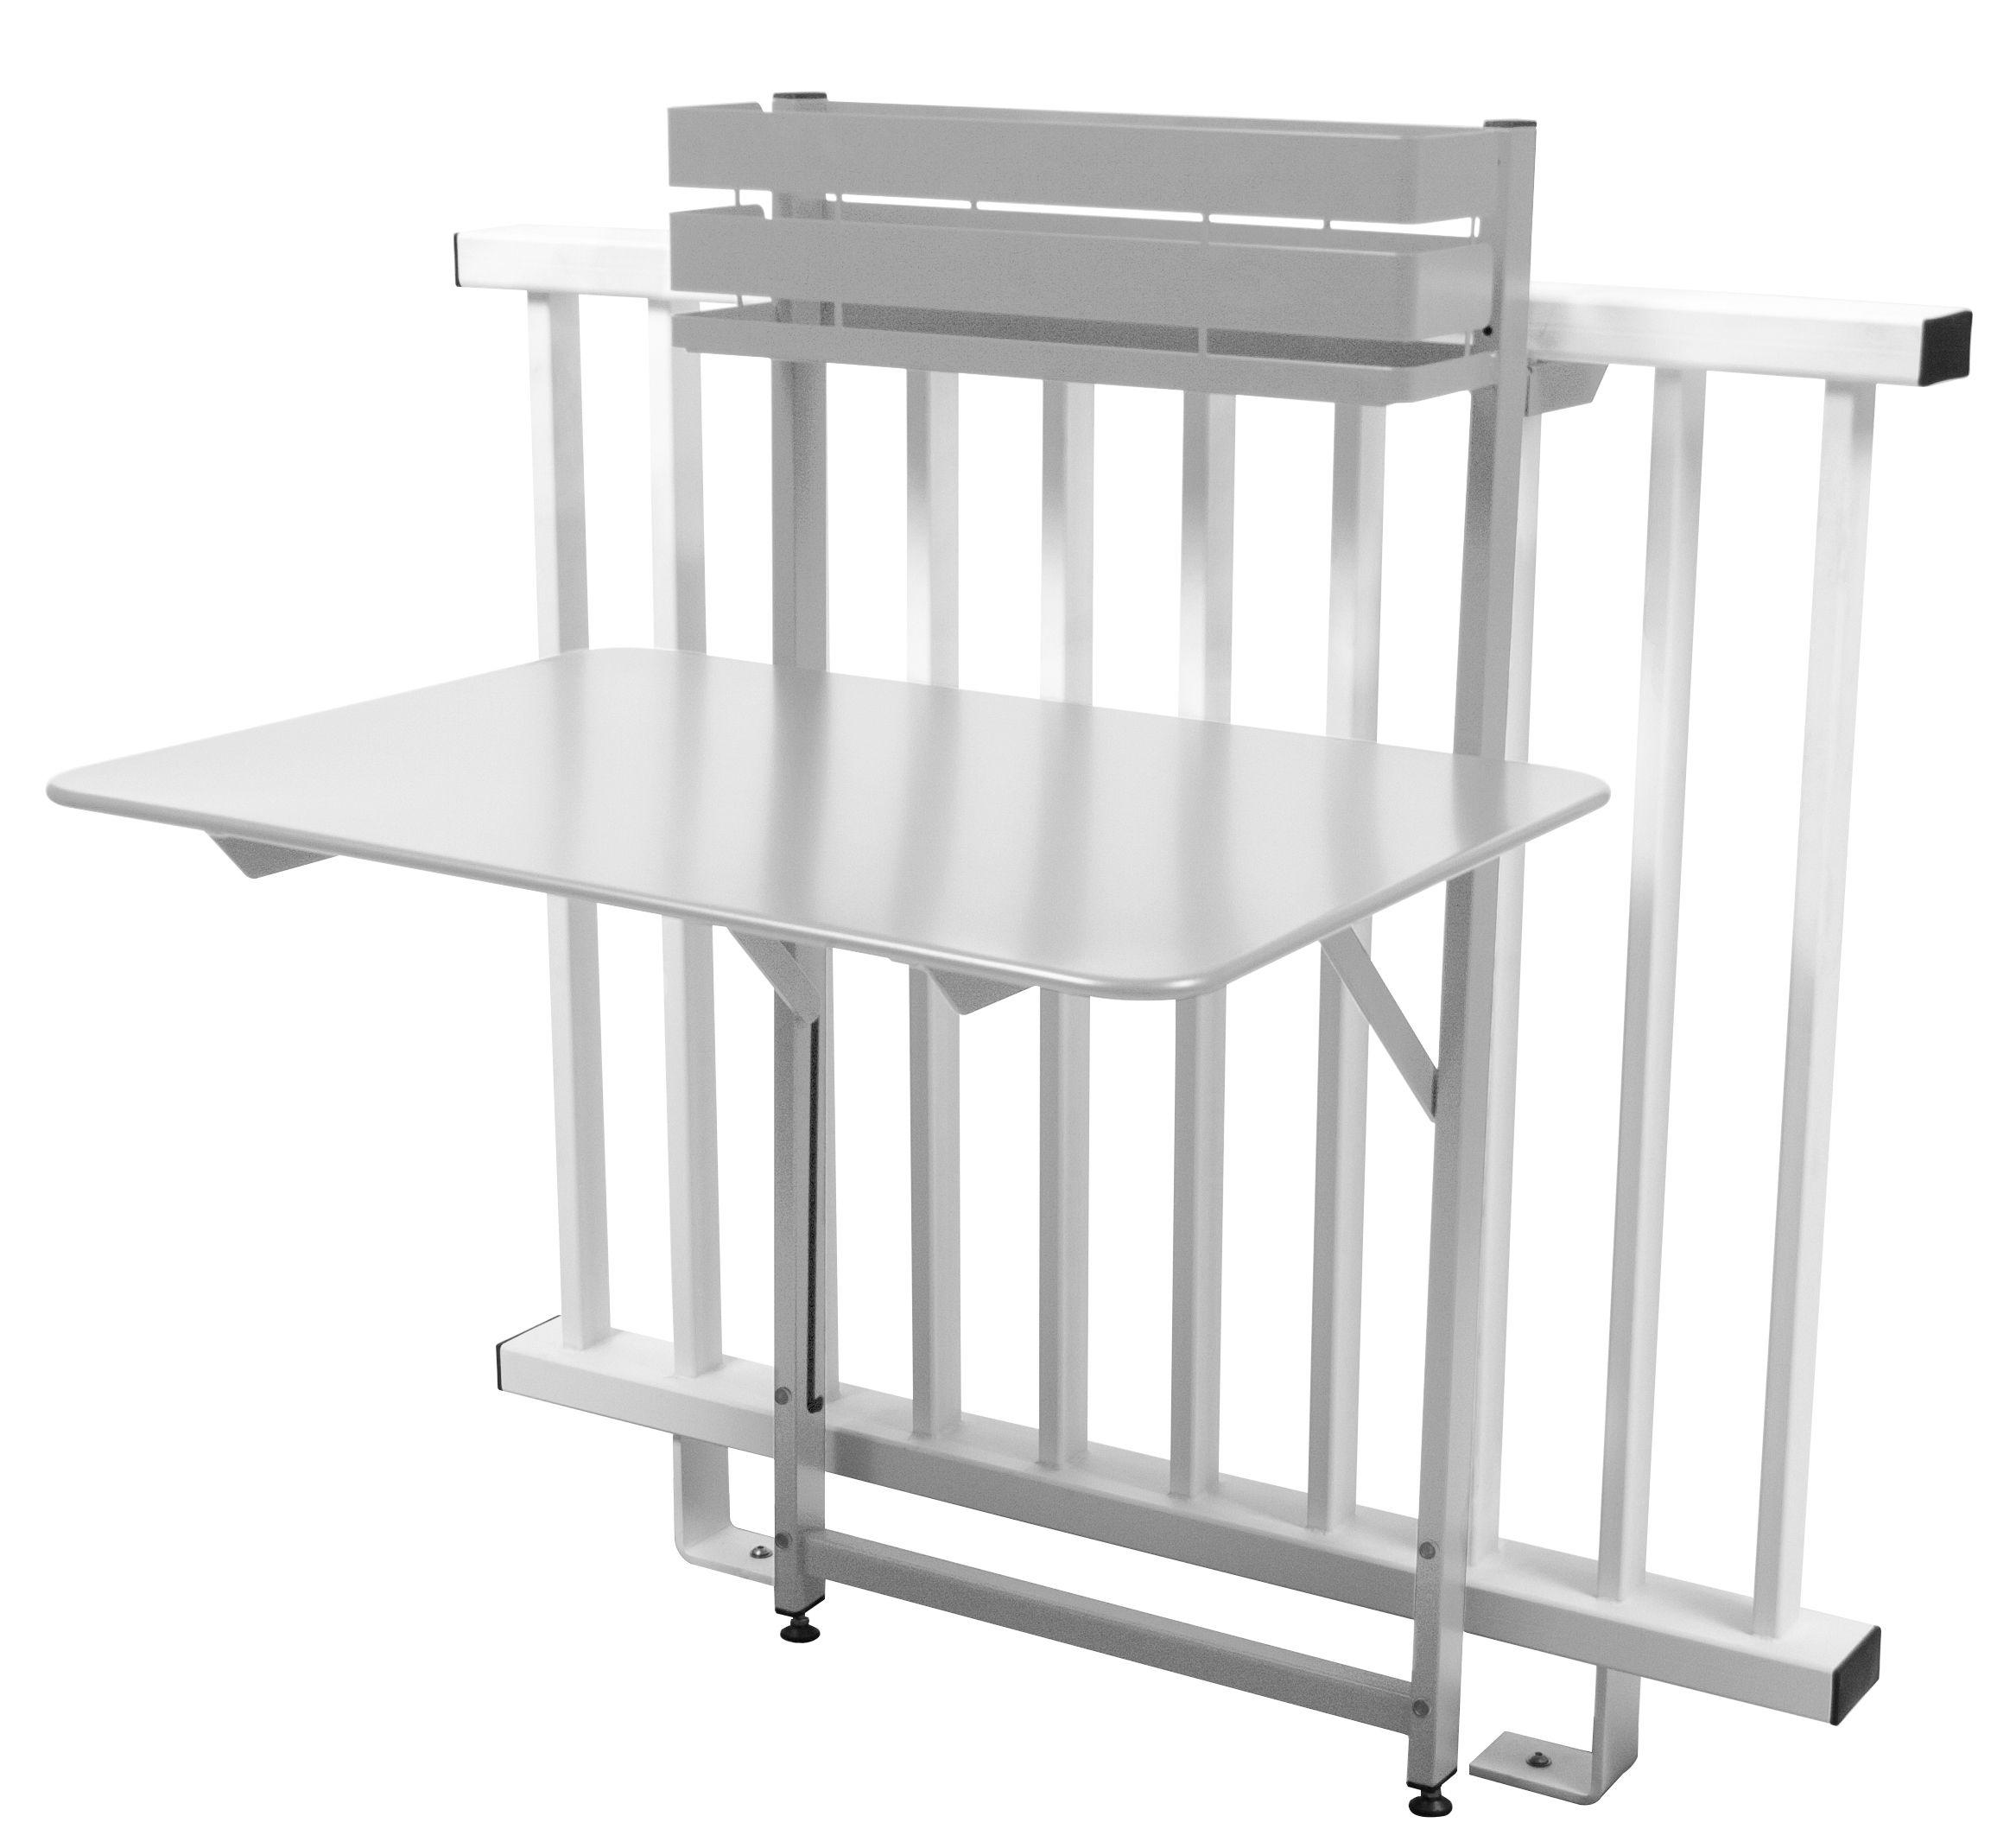 Table pliante balcon bistro rabattable 77 x 64 cm fermob gris m tal ebay Table balcon pliante rabattable